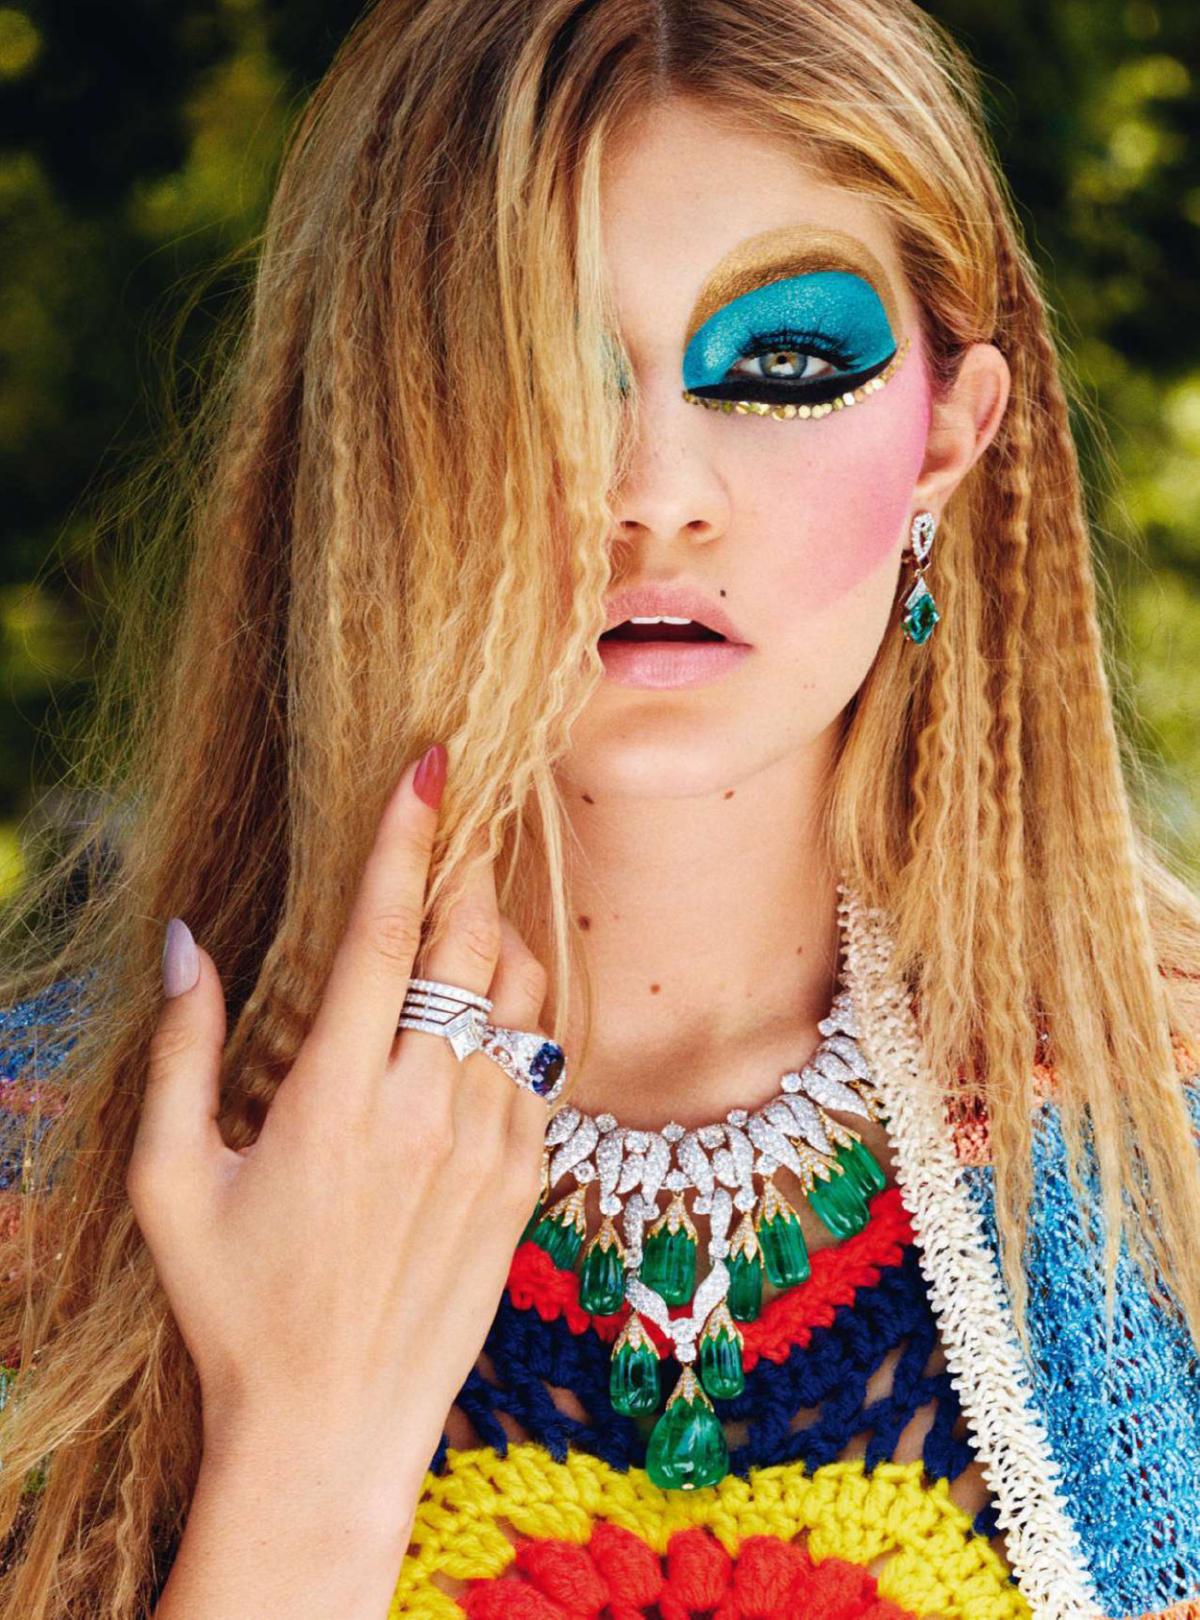 Gigi Hadid in 'Rare Gems' by Michael Avedon for Harper's Bazaar UK